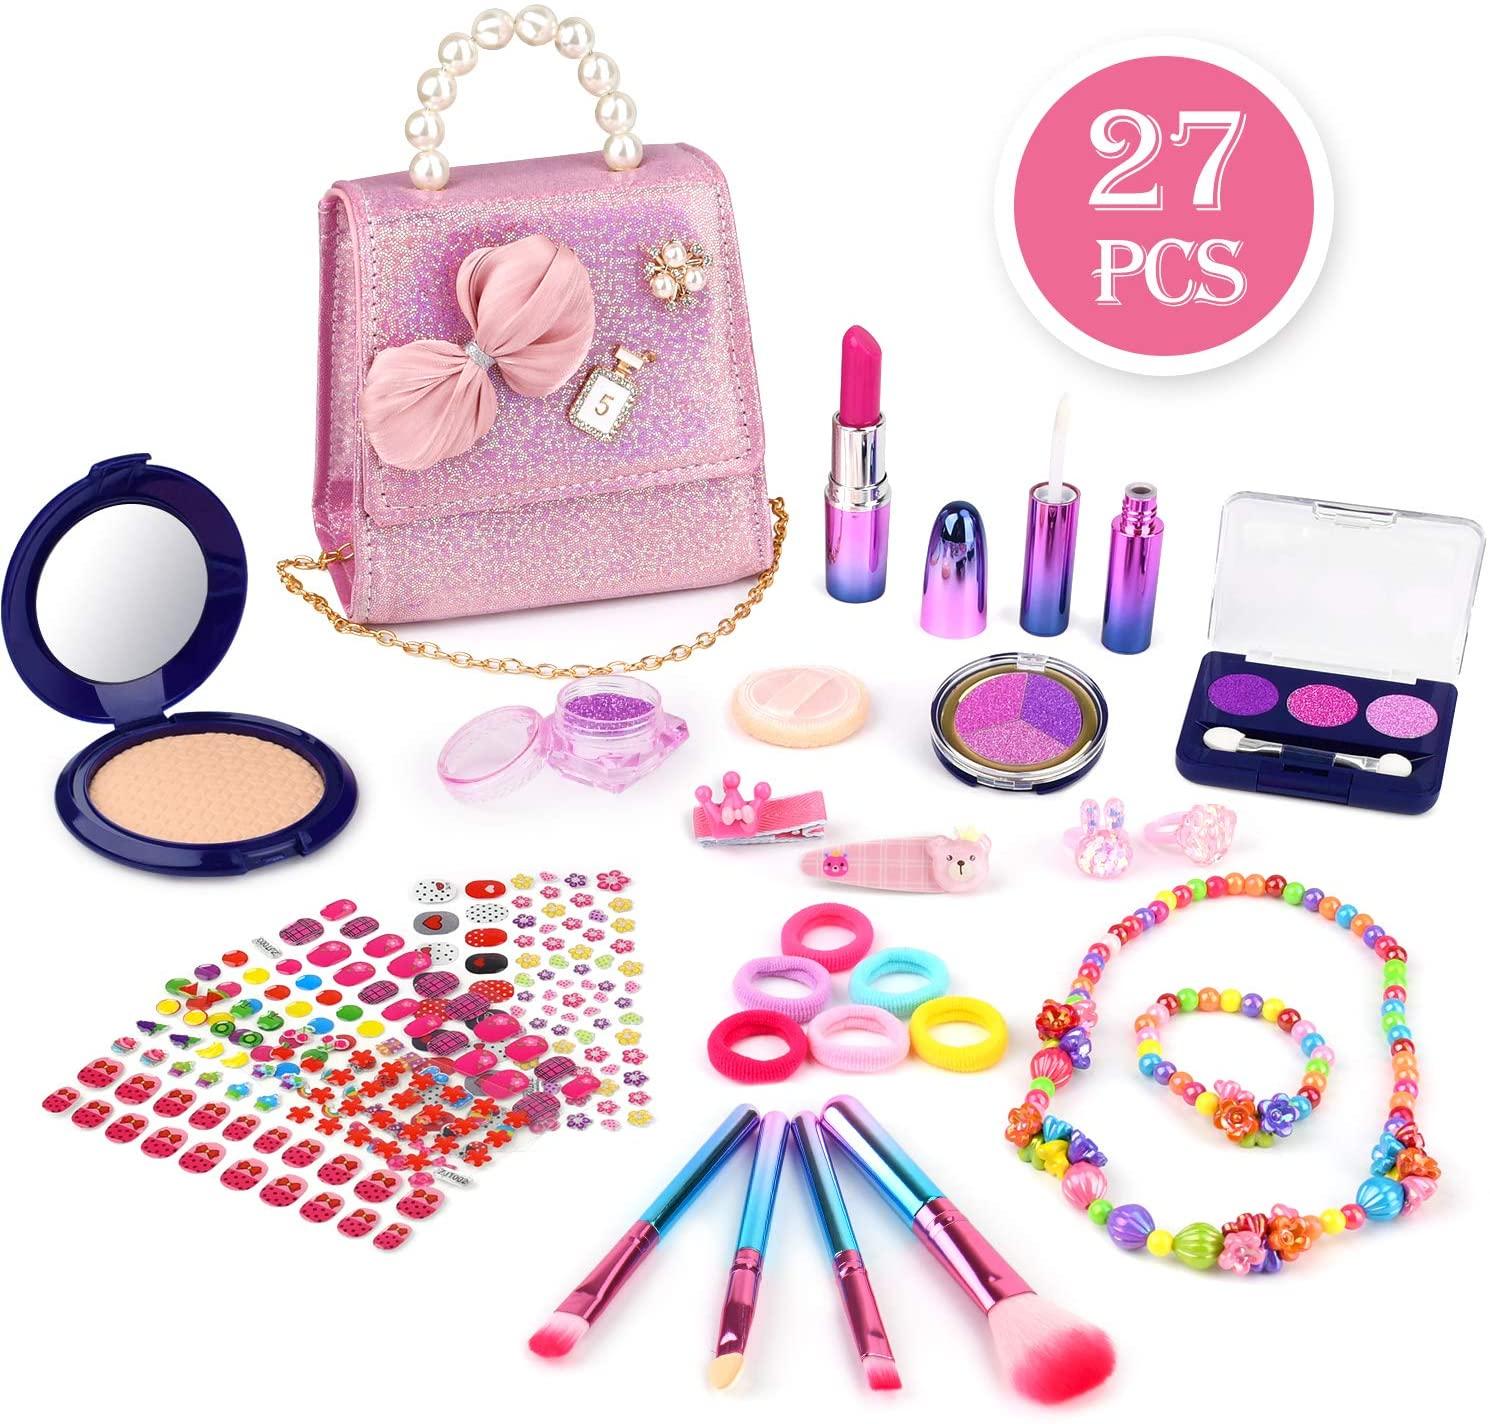 Bakeling 27 Pcs Girls Pretend Makeup Kit Safe & No-Toxic Makeup Toy Set for Kids Fake Make Up Kits Cosmetics Set with Fashion Pearl Bag for Little Girls Birthday Christmas.